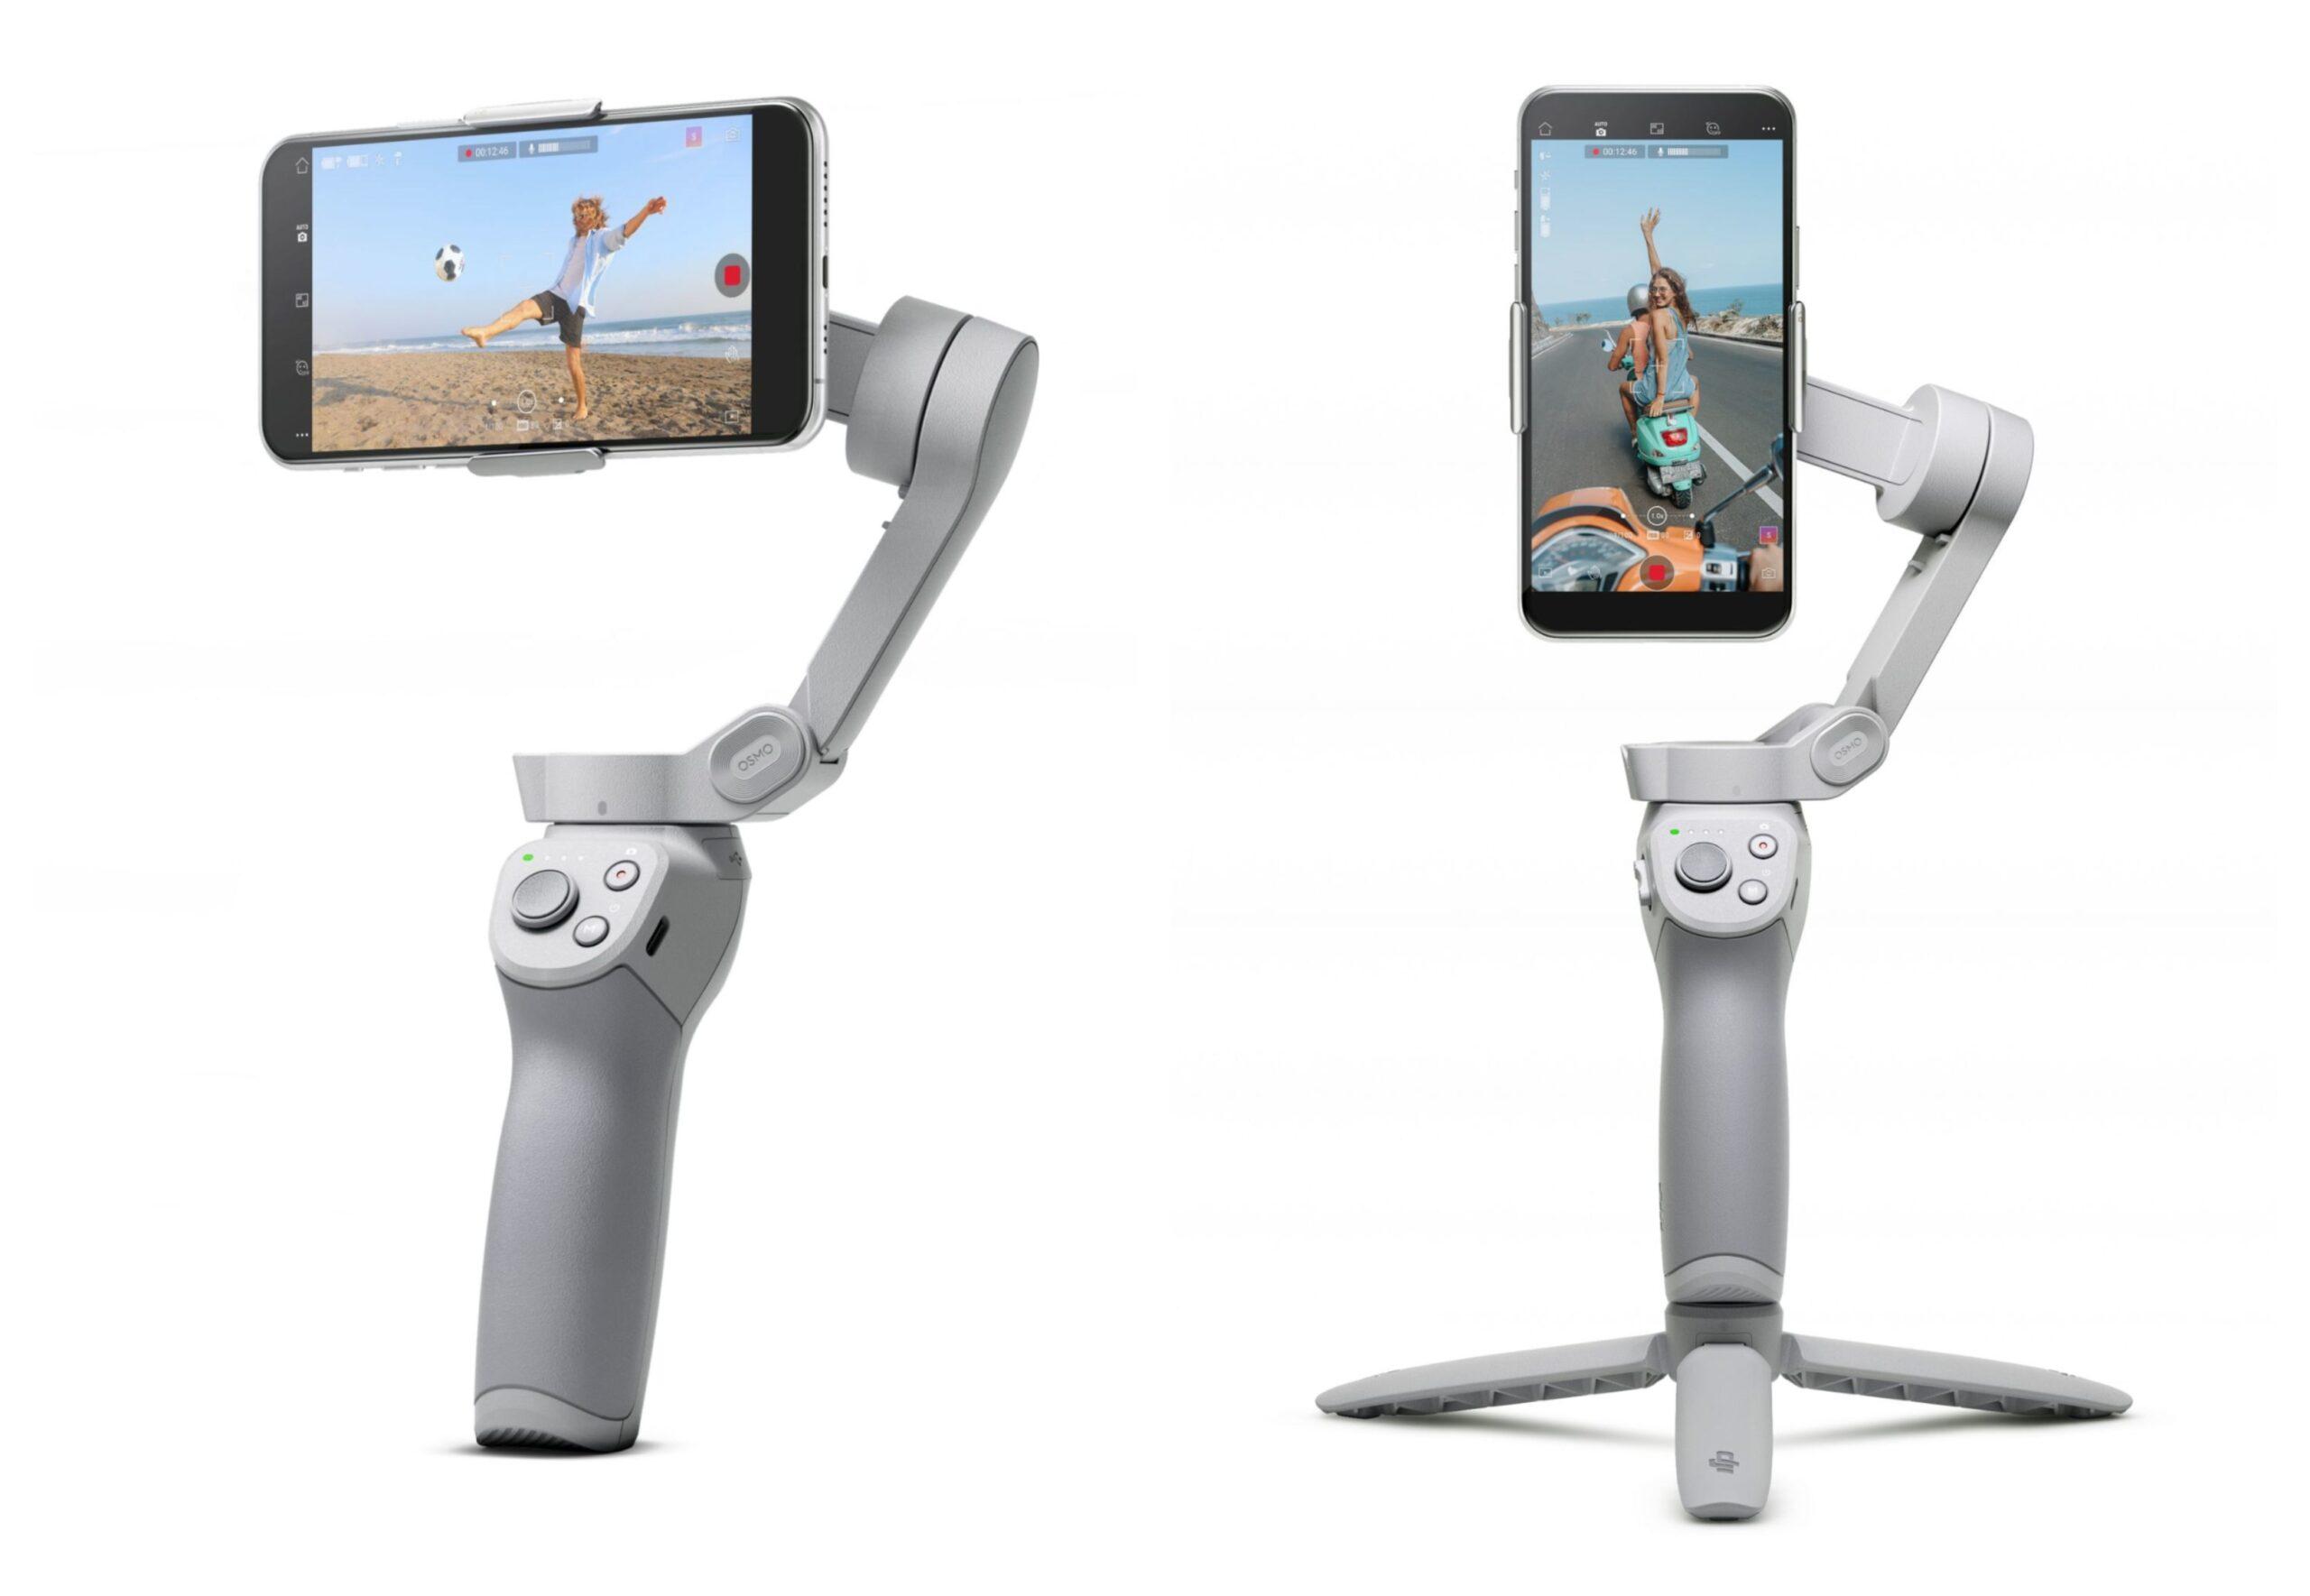 DJI-Osmo-Mobile-4-image